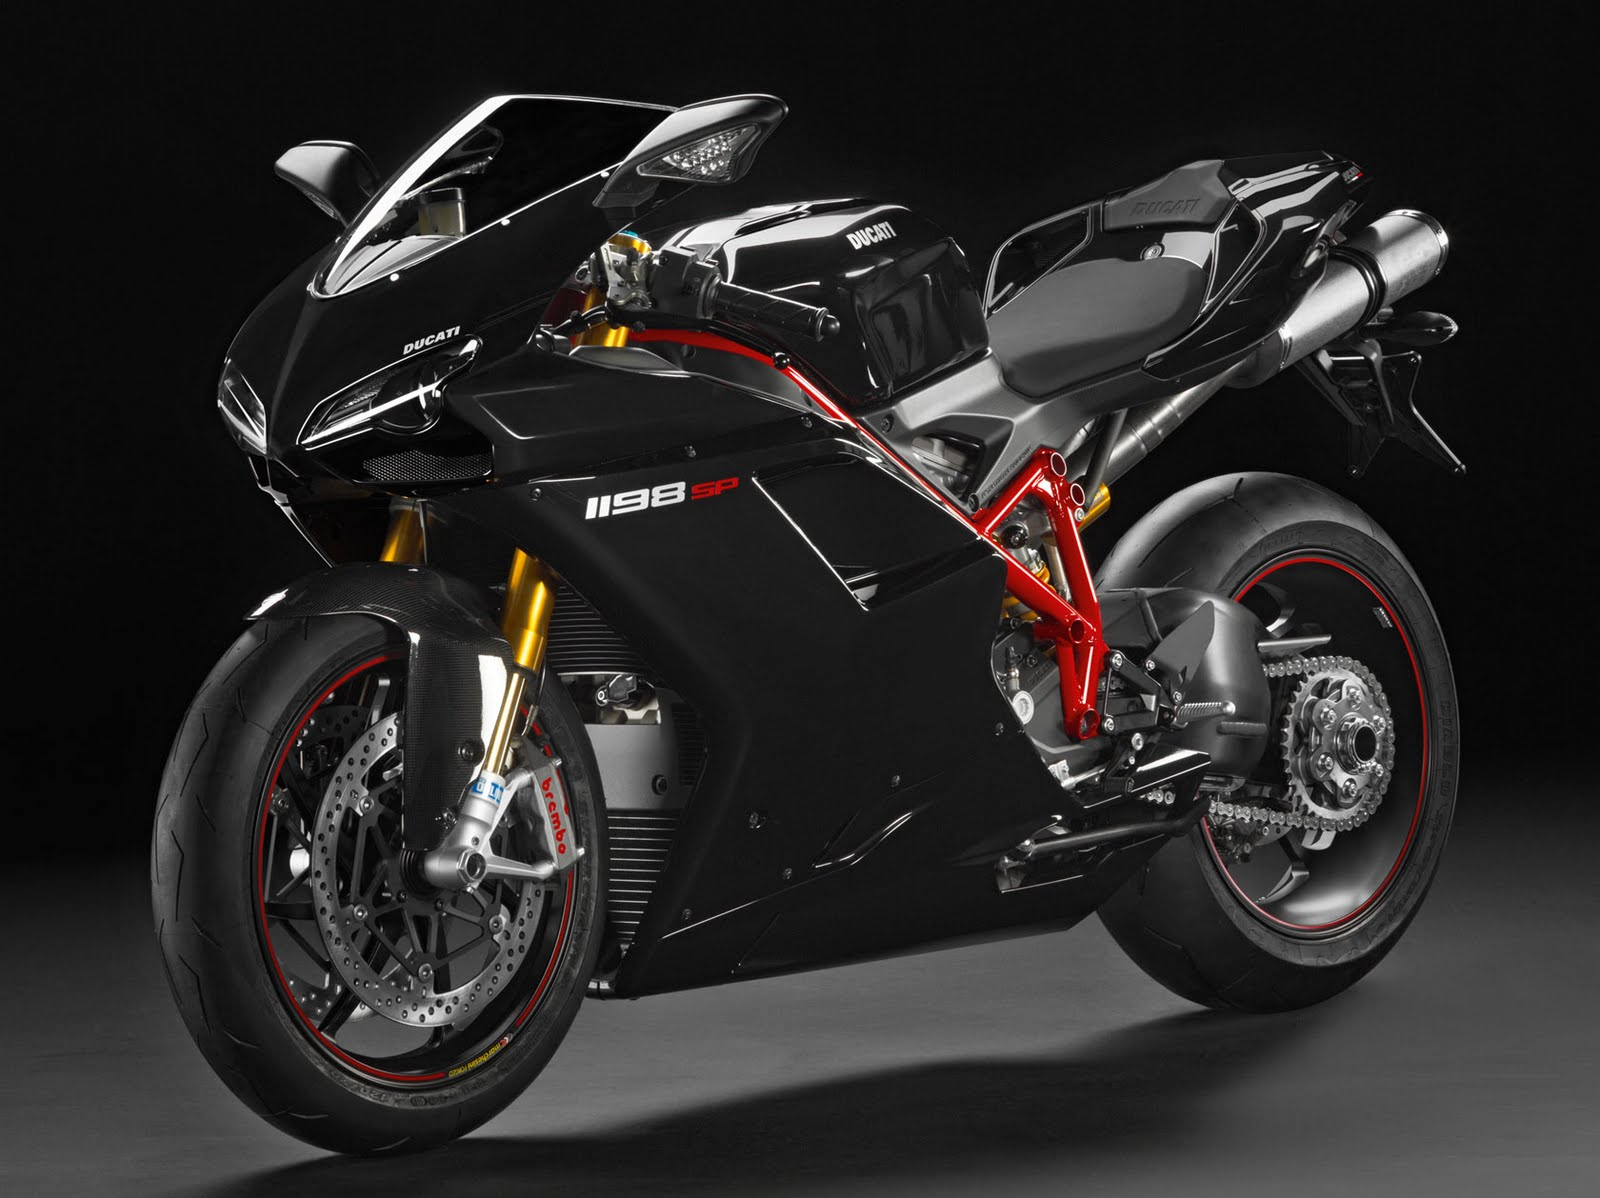 Top Motorcycle Wallpapers 2011 Ducati 1198SP Superbike